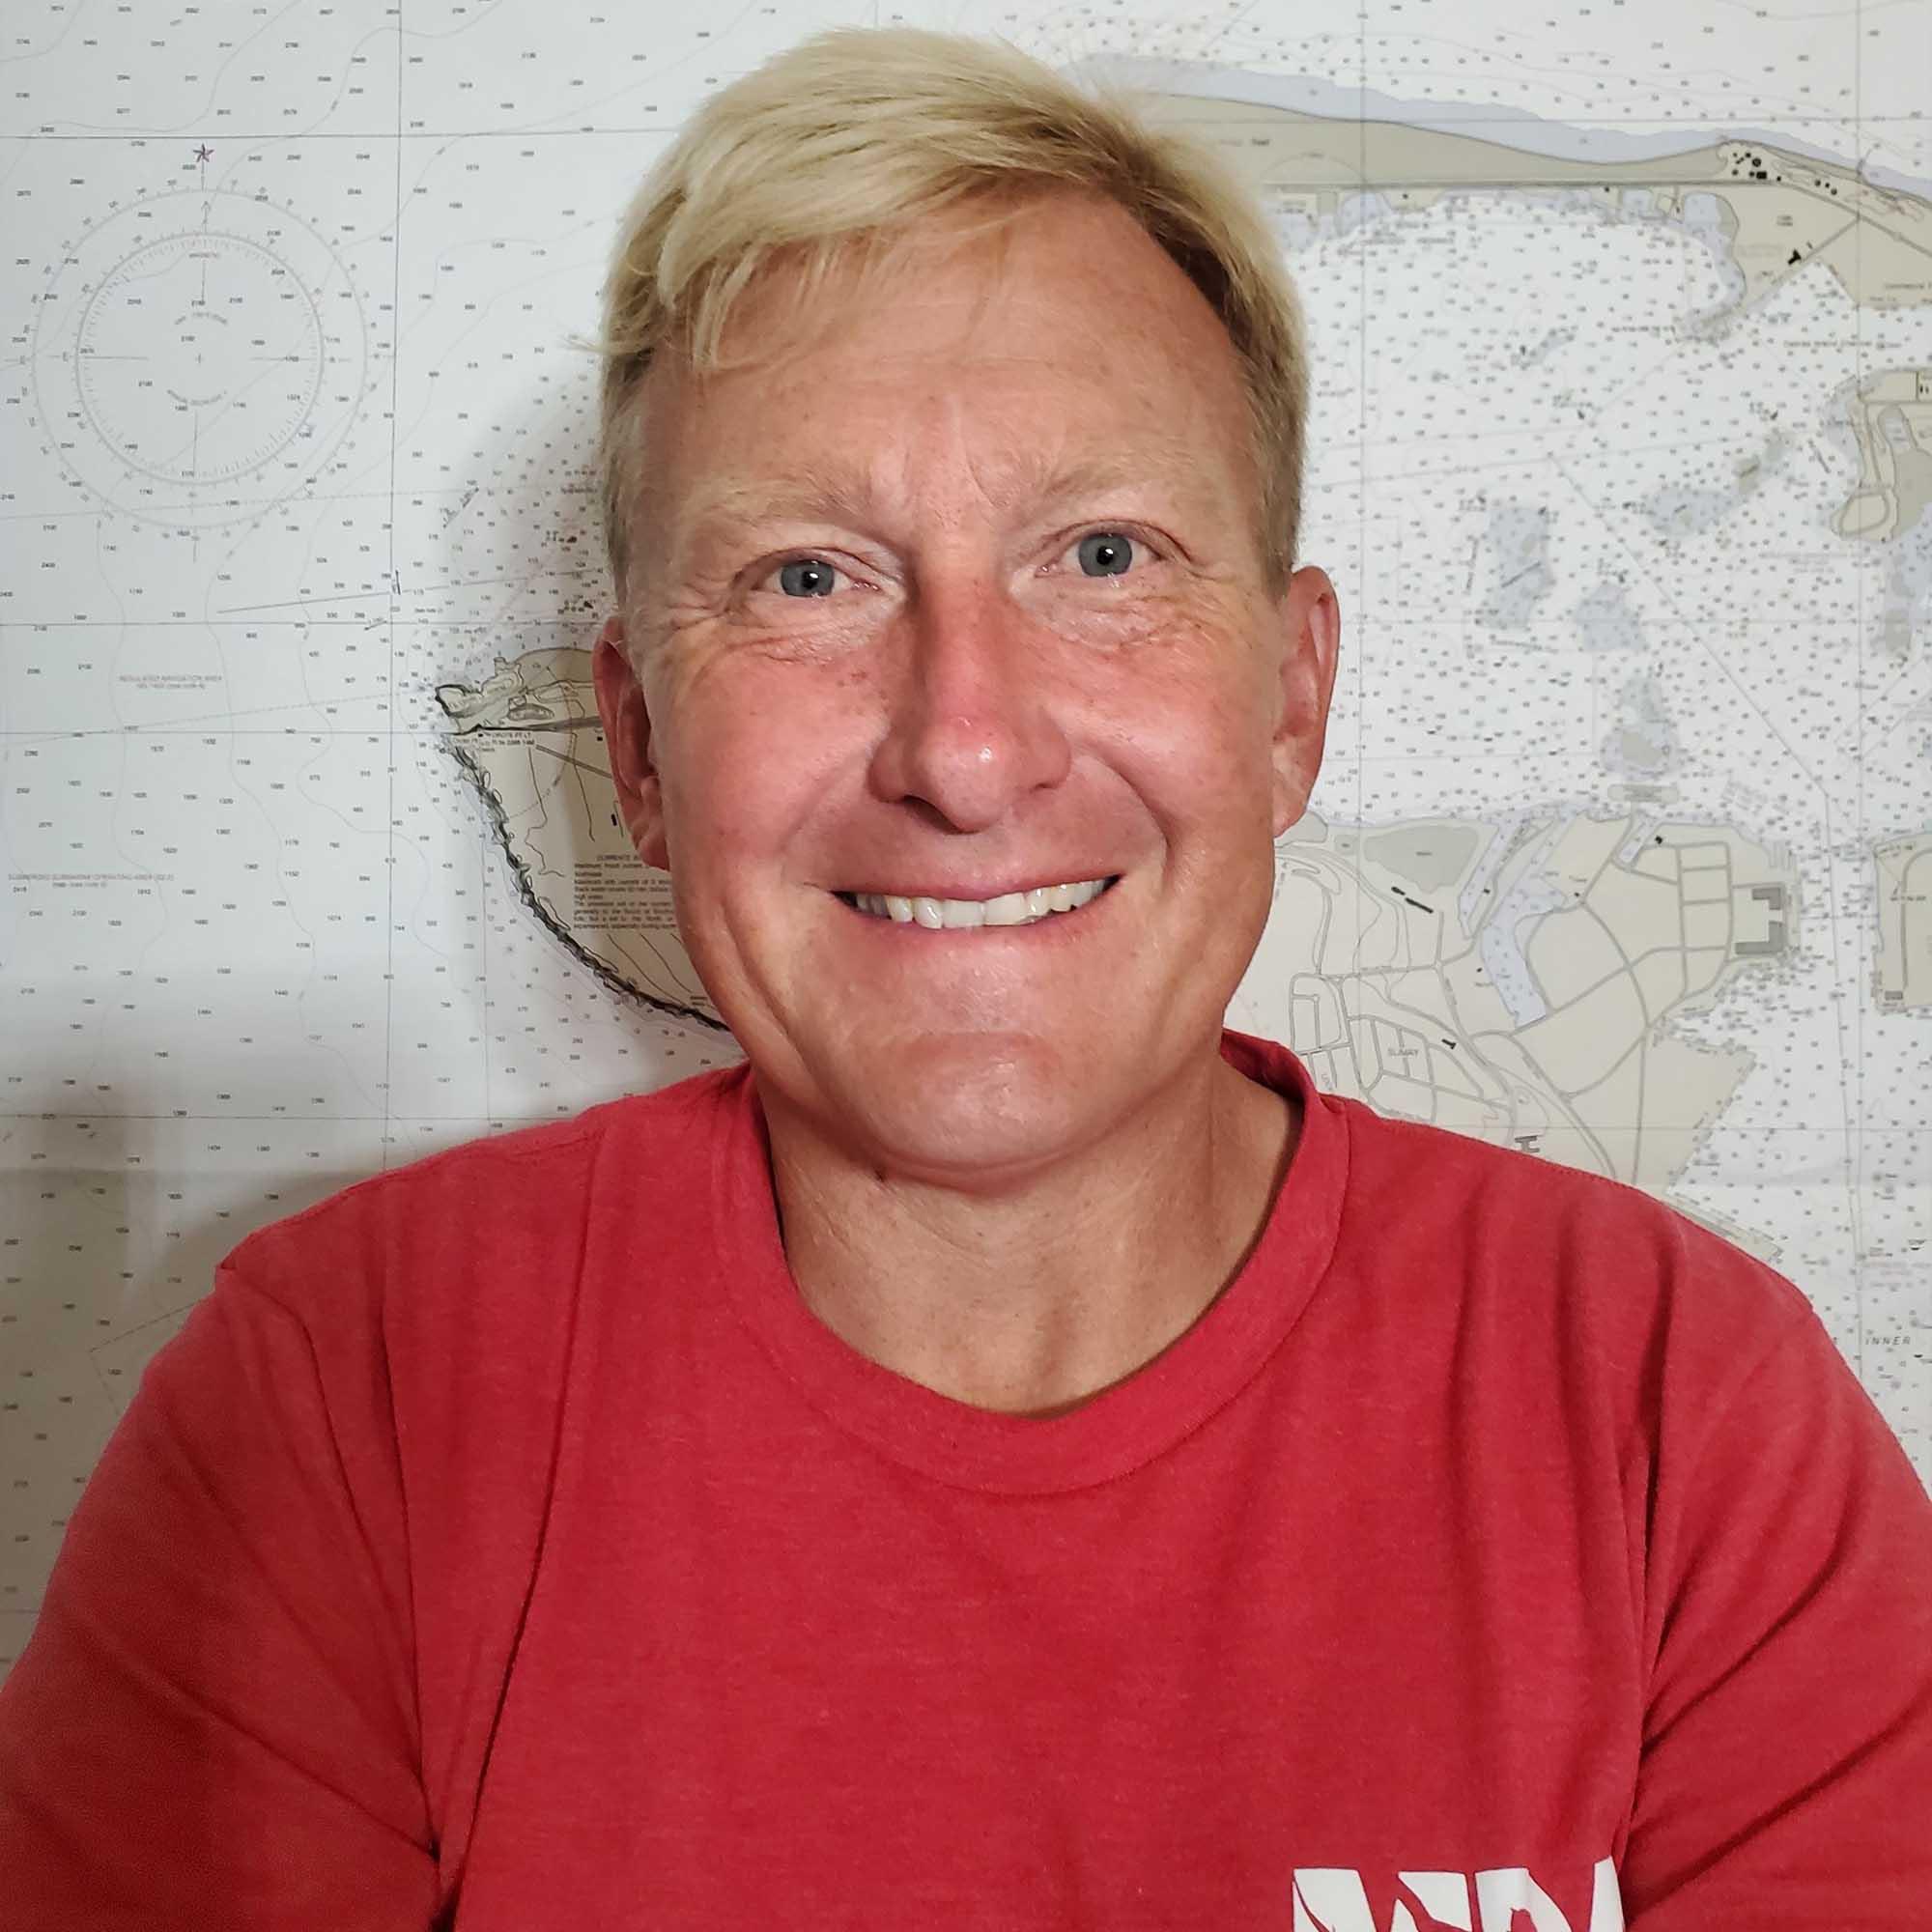 Greg Holt